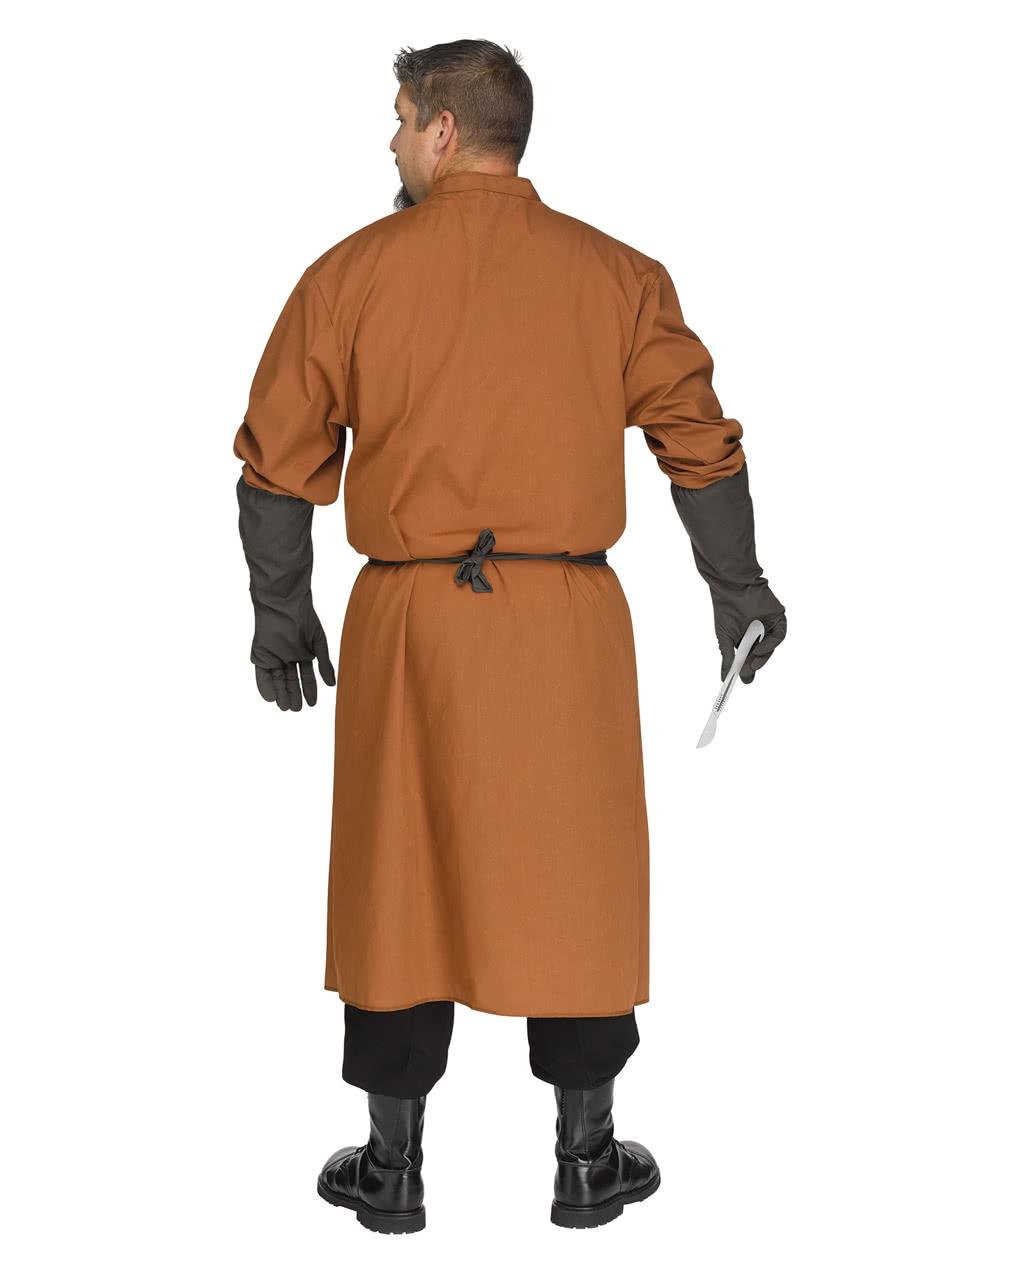 c2df5a914c21b Psycho Doctor Costume | Halloween disguise | horror-shop.com